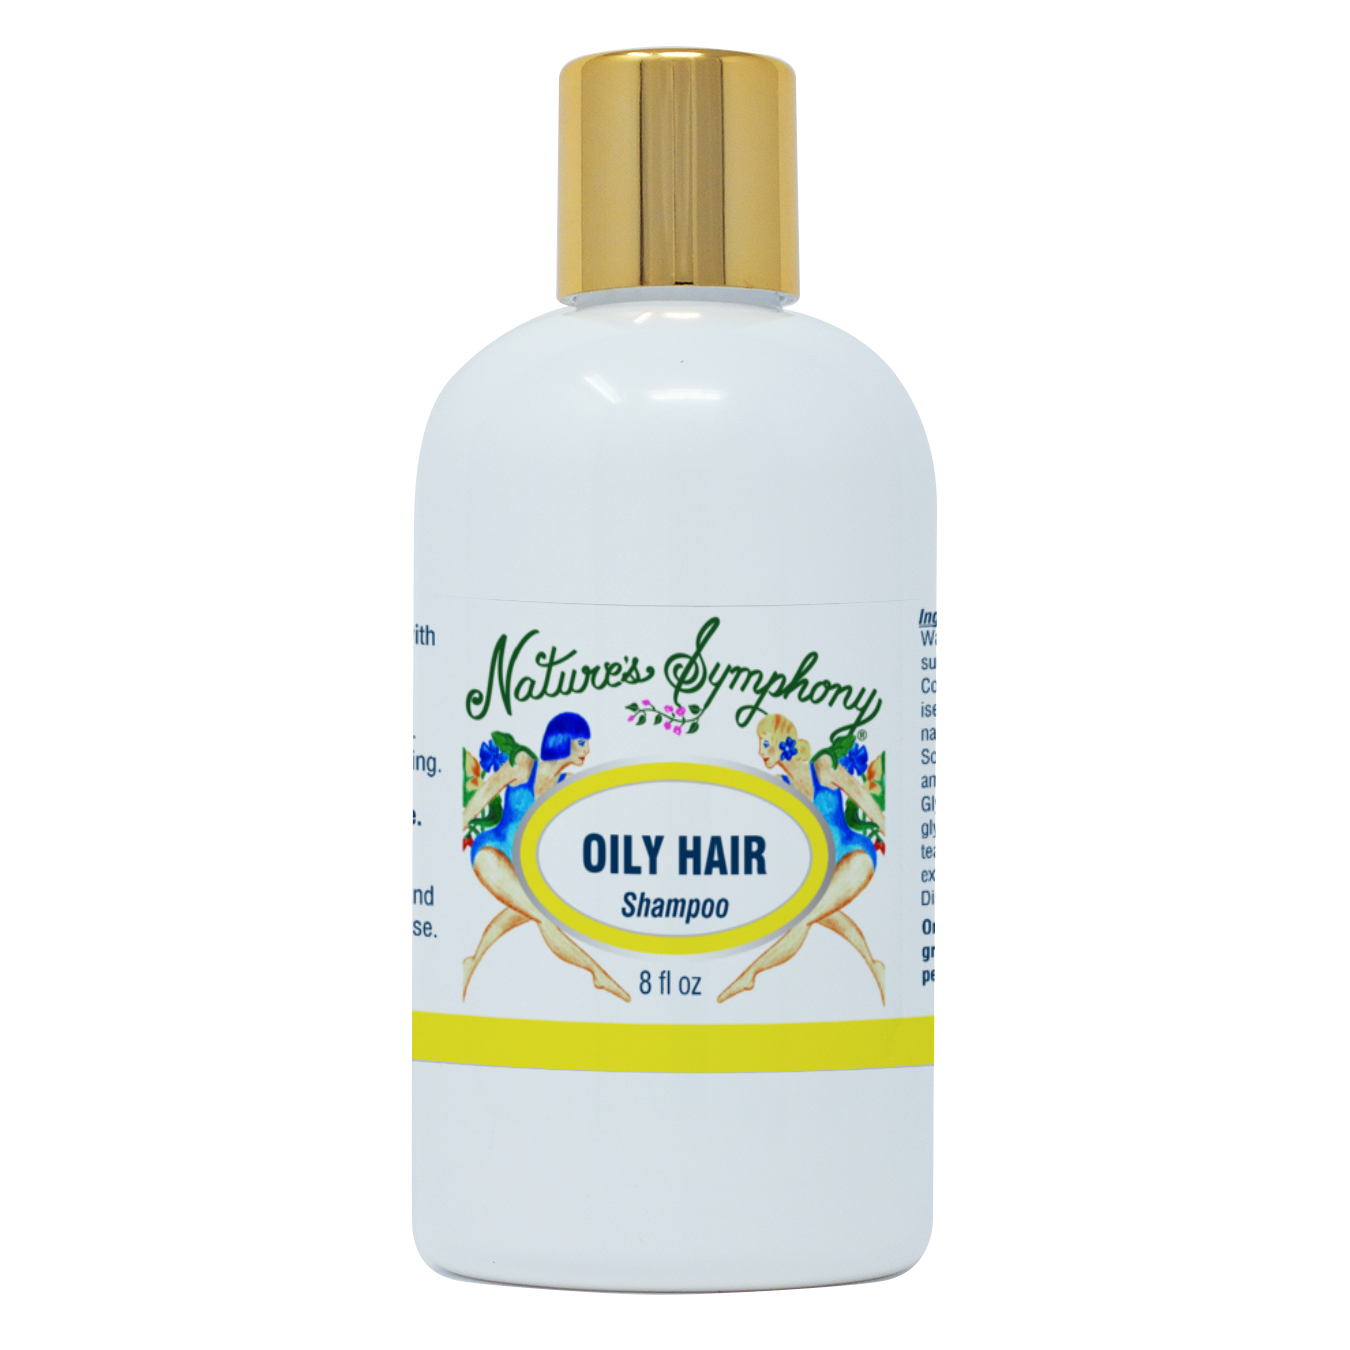 Oily Hair, Organic Shampoo - 8 fl. oz. (236ml)